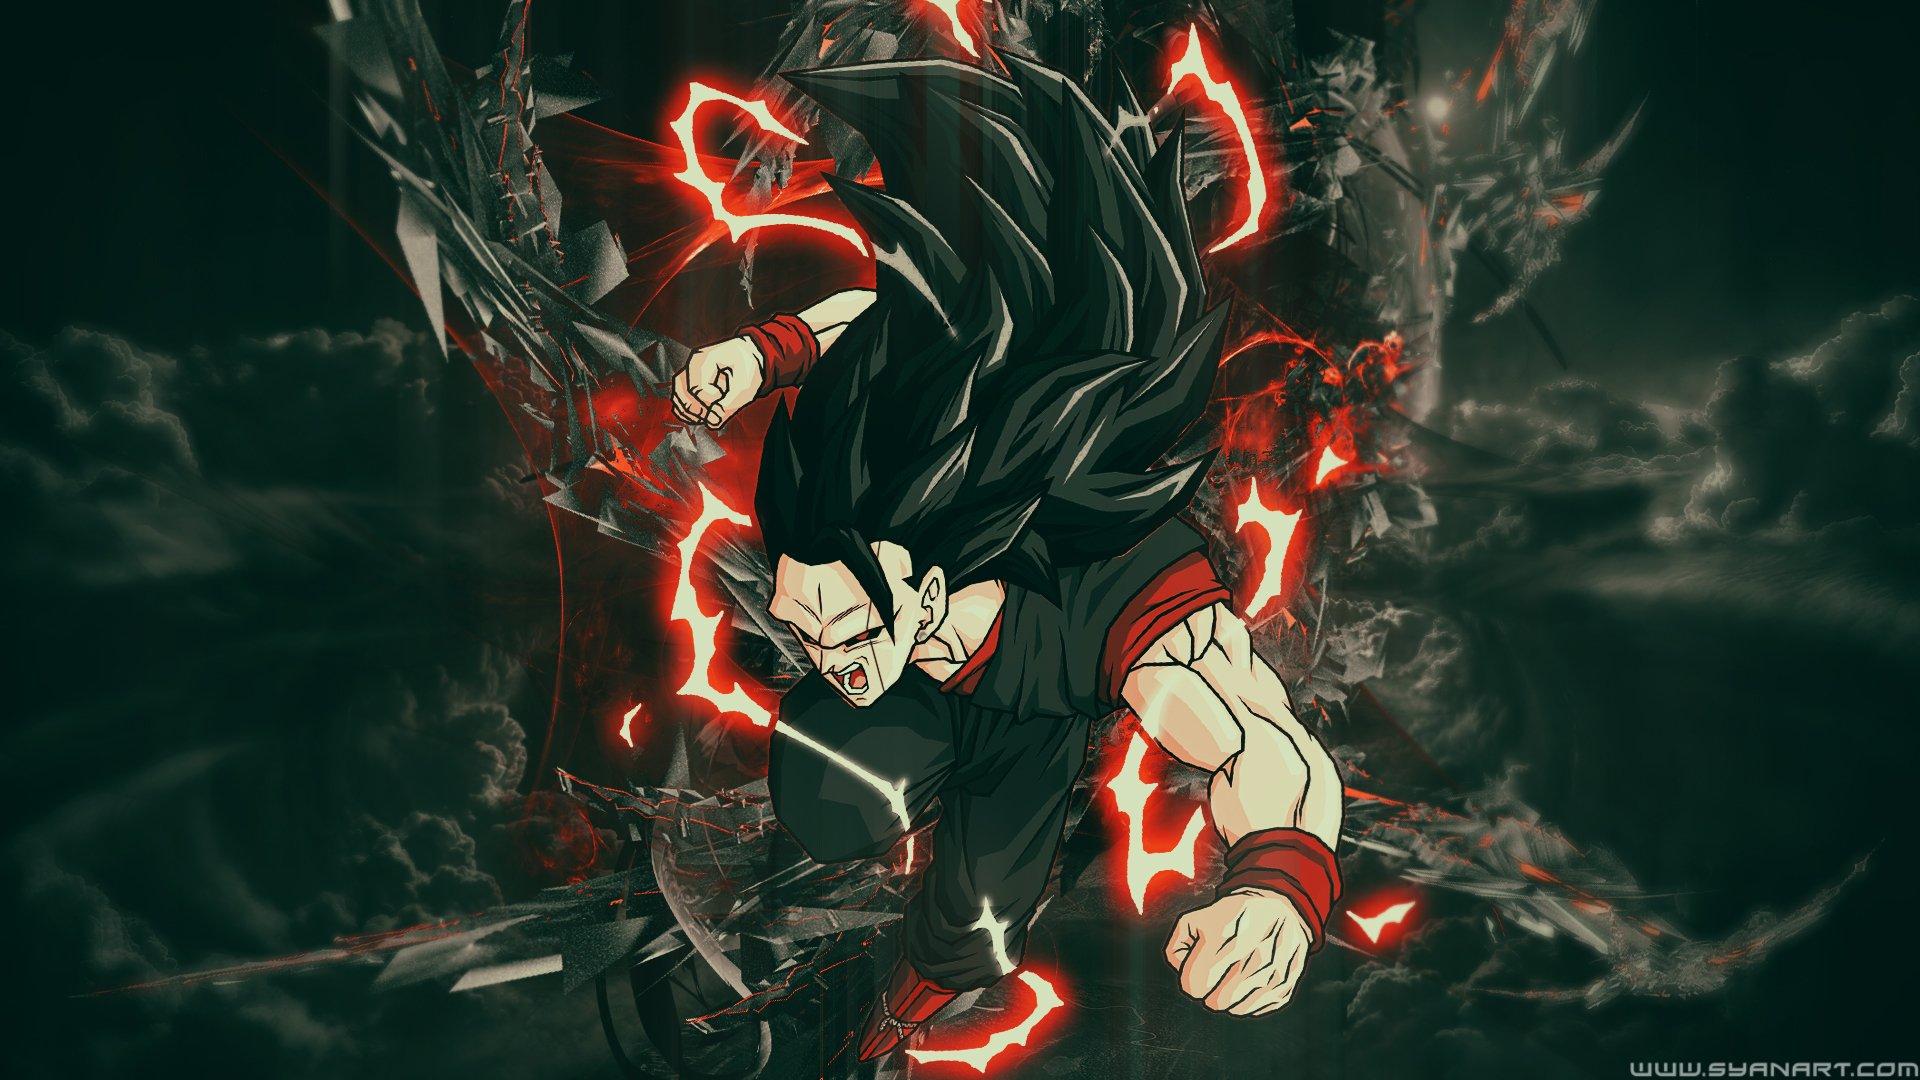 Black Goku Fondo De Pantalla And Fondo De Escritorio: DBS Goku Black SSJ3 Fondo De Pantalla HD